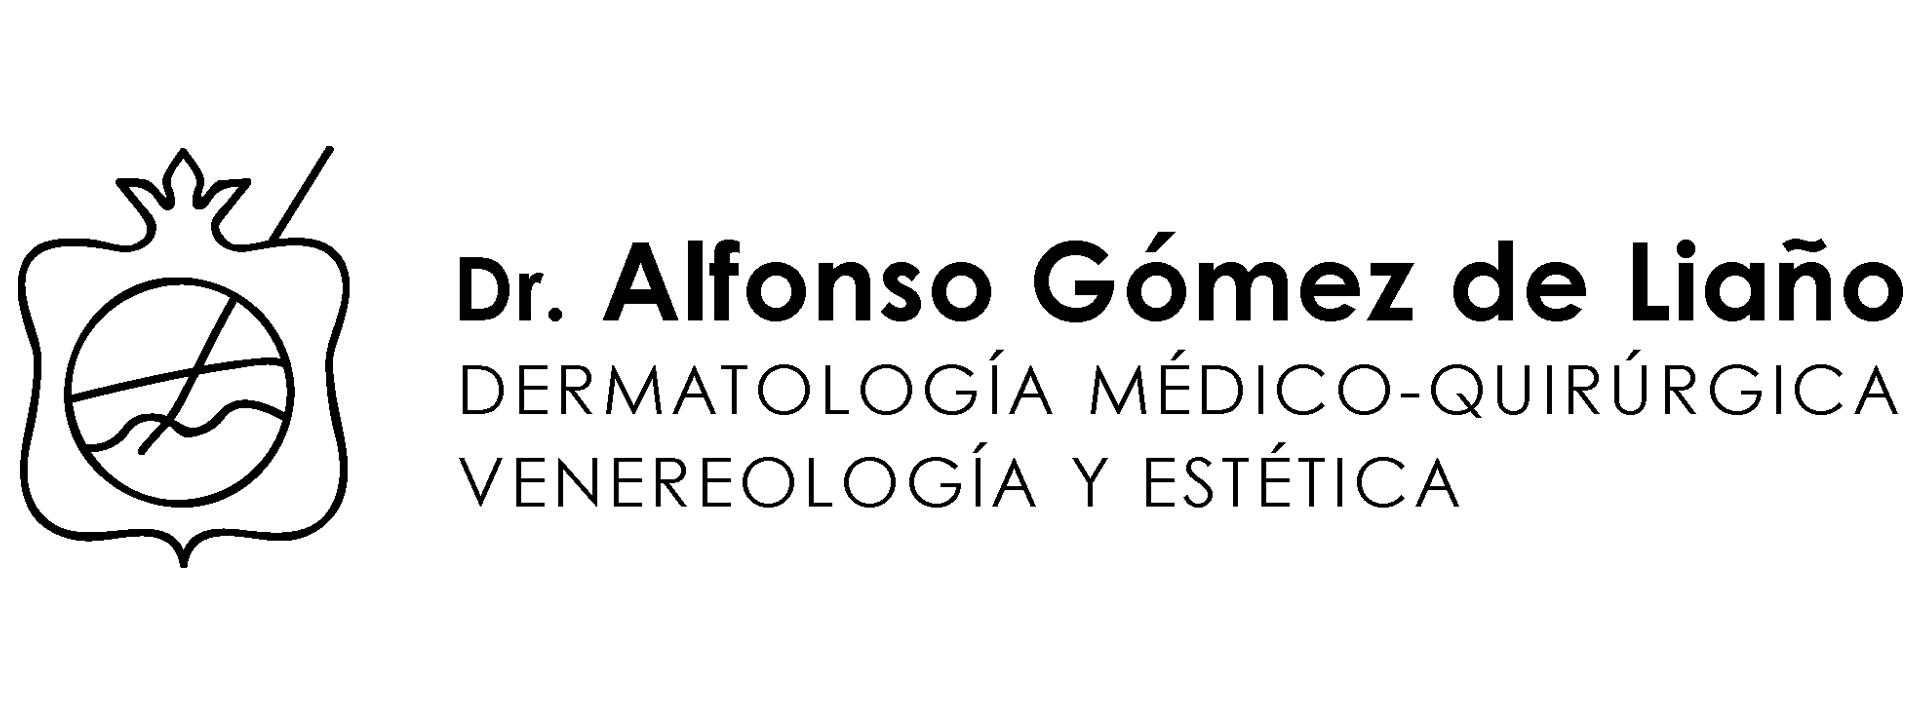 ALFONSO GOMEZ DE LIAÑO